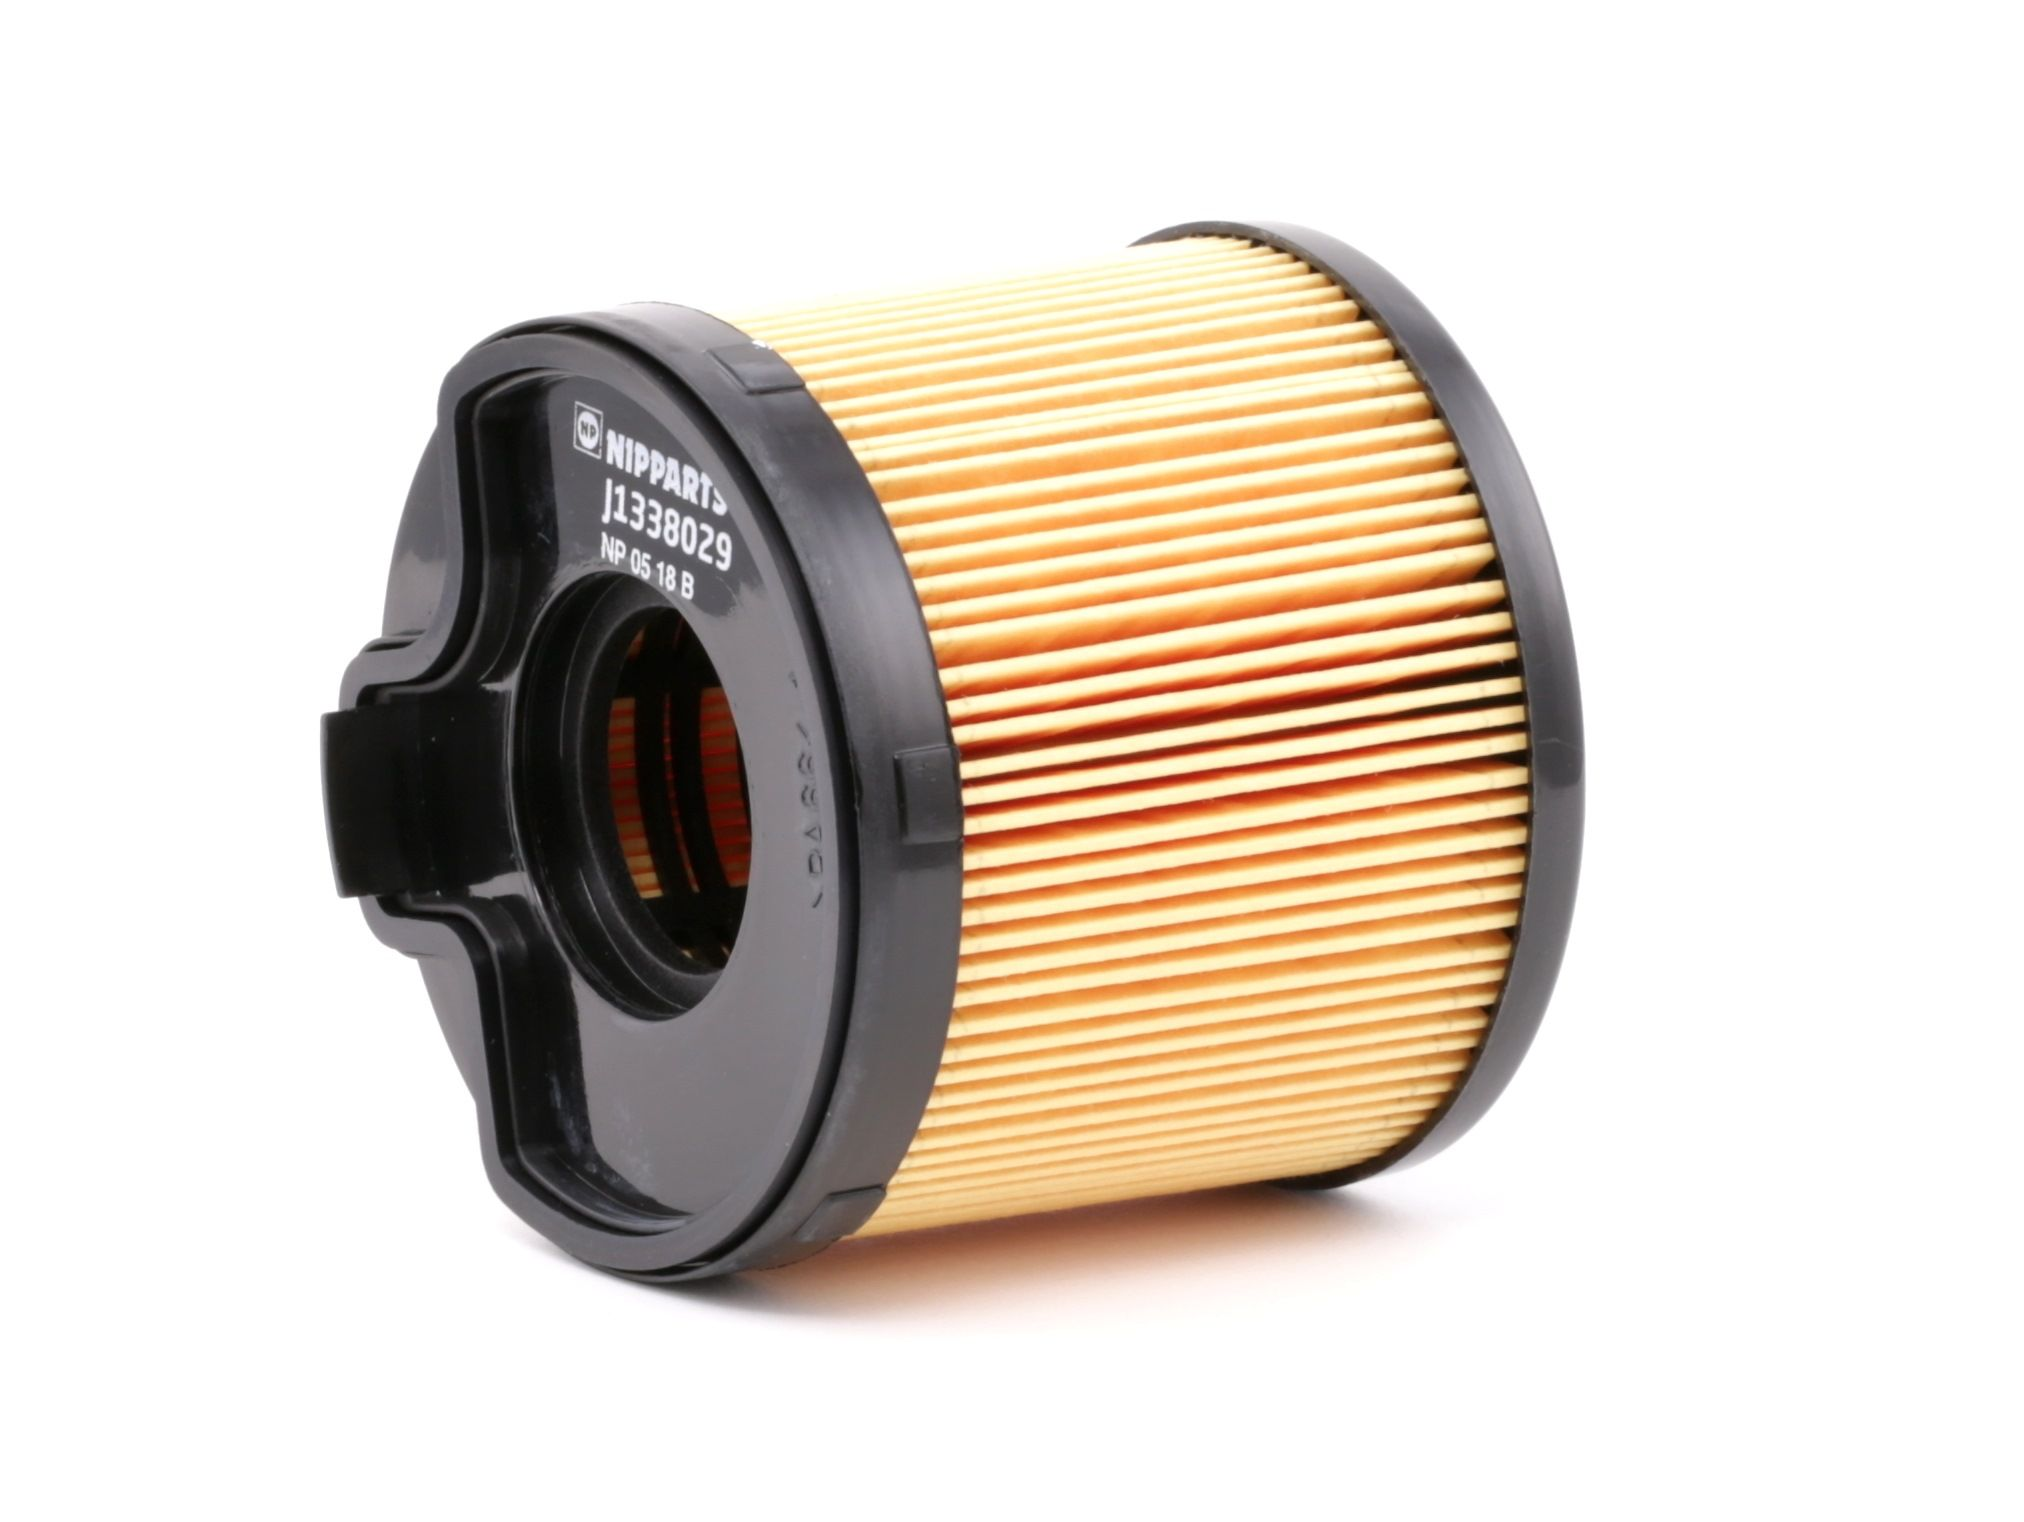 Original CITROËN Palivový filtr J1338029